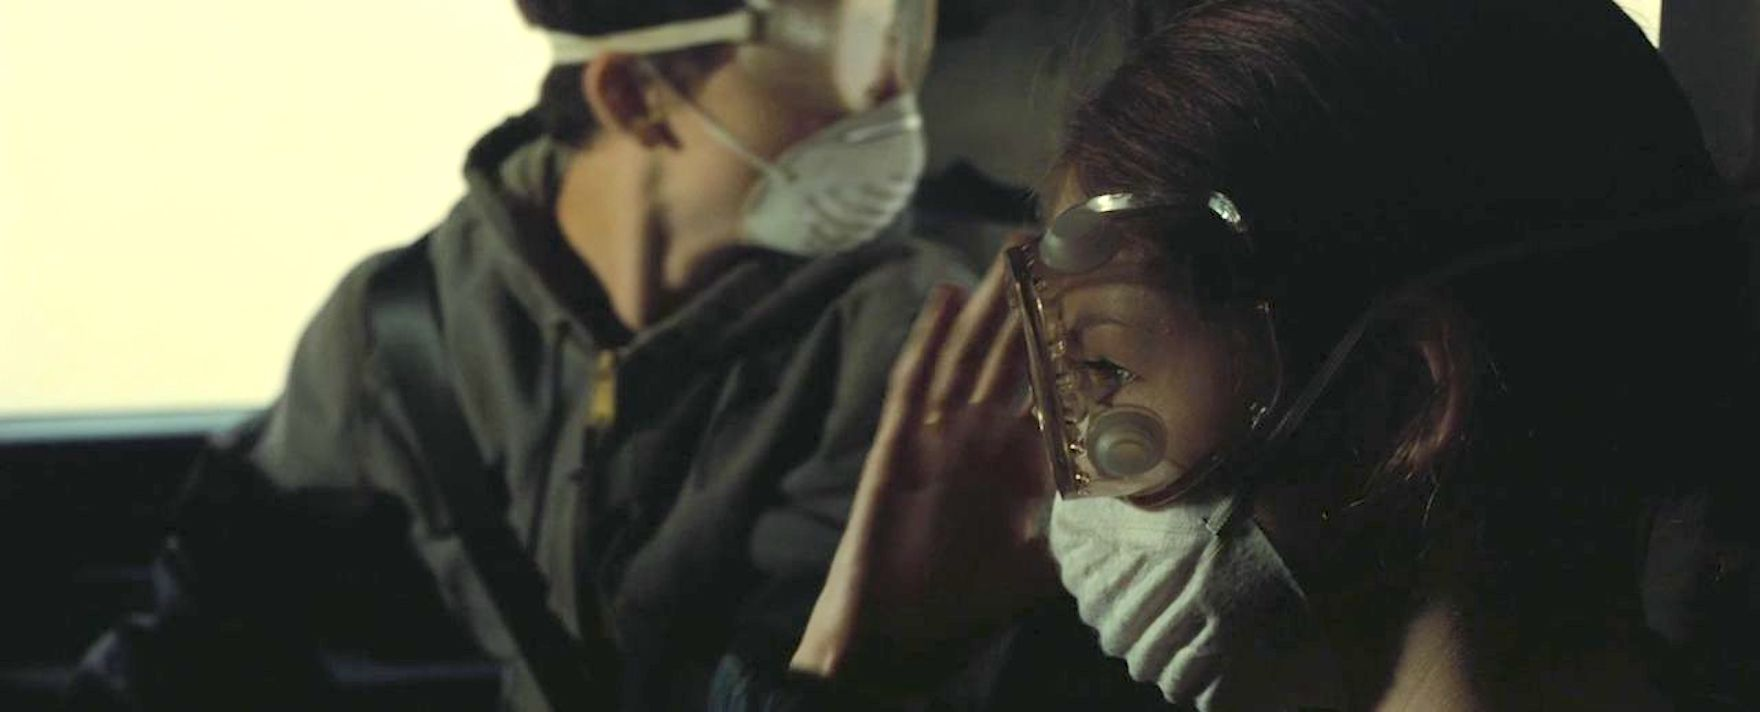 Timothée Chalamet and Mackenzie Foy in Interstellar (2014)